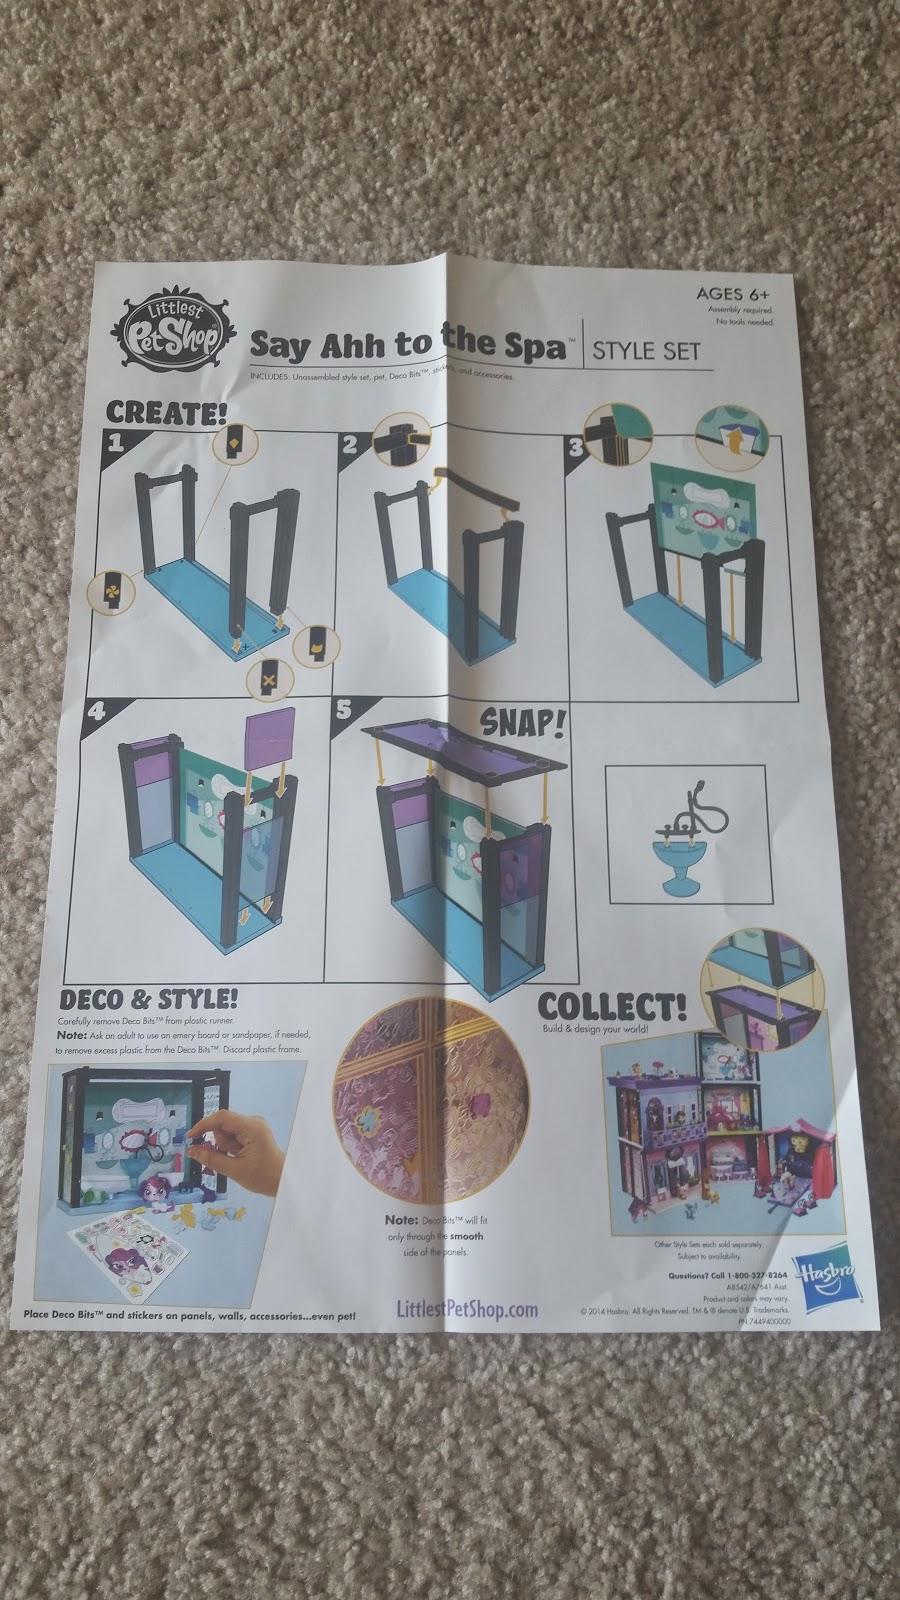 Littlest Pet Shop Pawsabilities Collection Sets Review #LPS via www.Productreviewmom.com